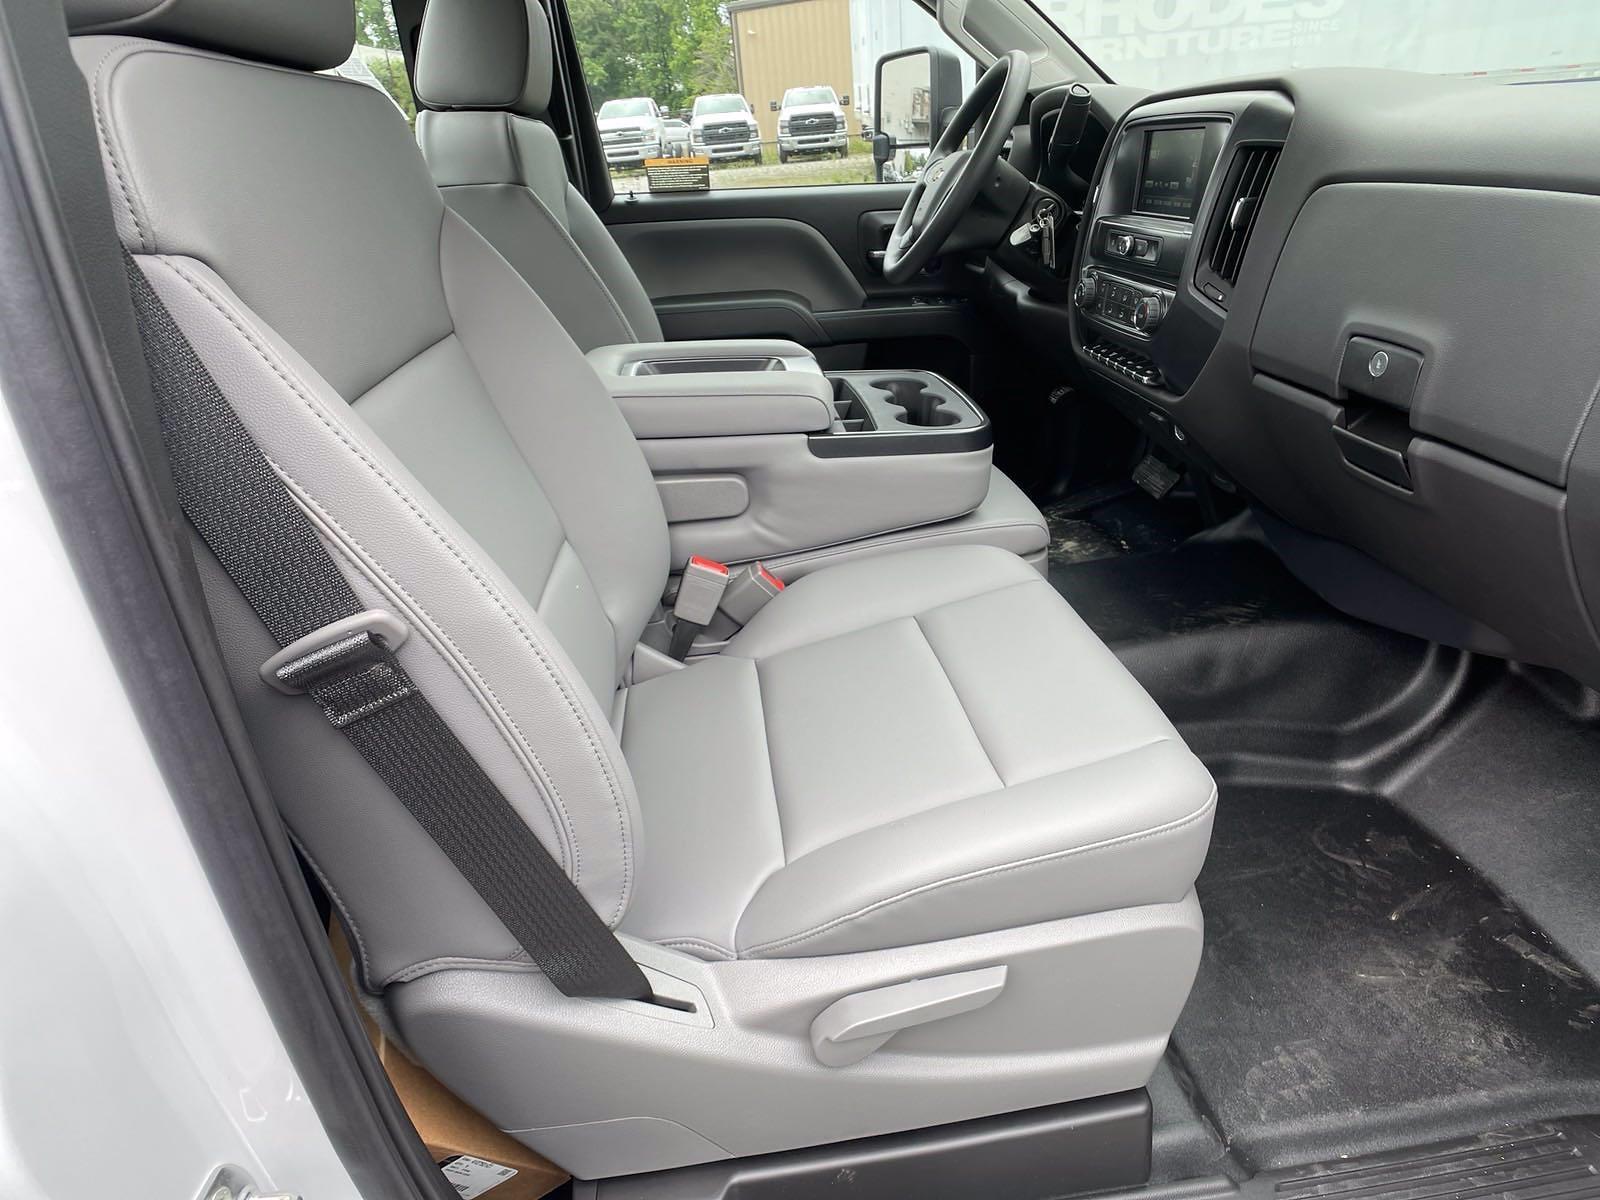 2021 Silverado 5500 Regular Cab DRW 4x2,  Cab Chassis #MD1009 - photo 5